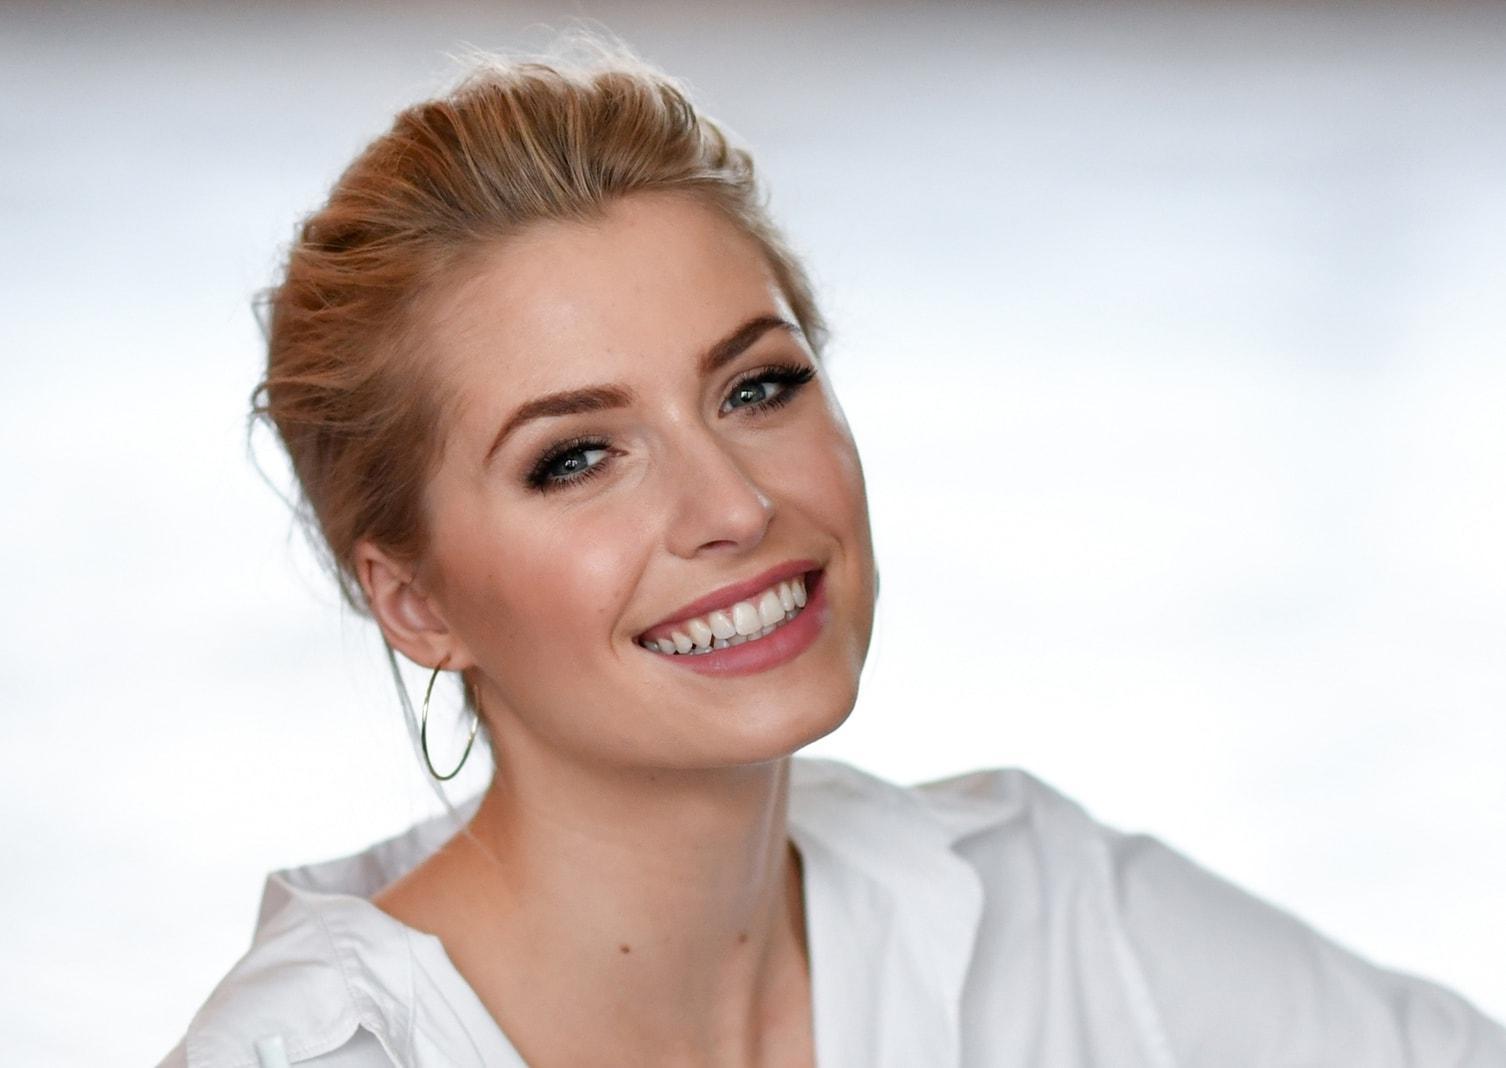 Lena Gercke